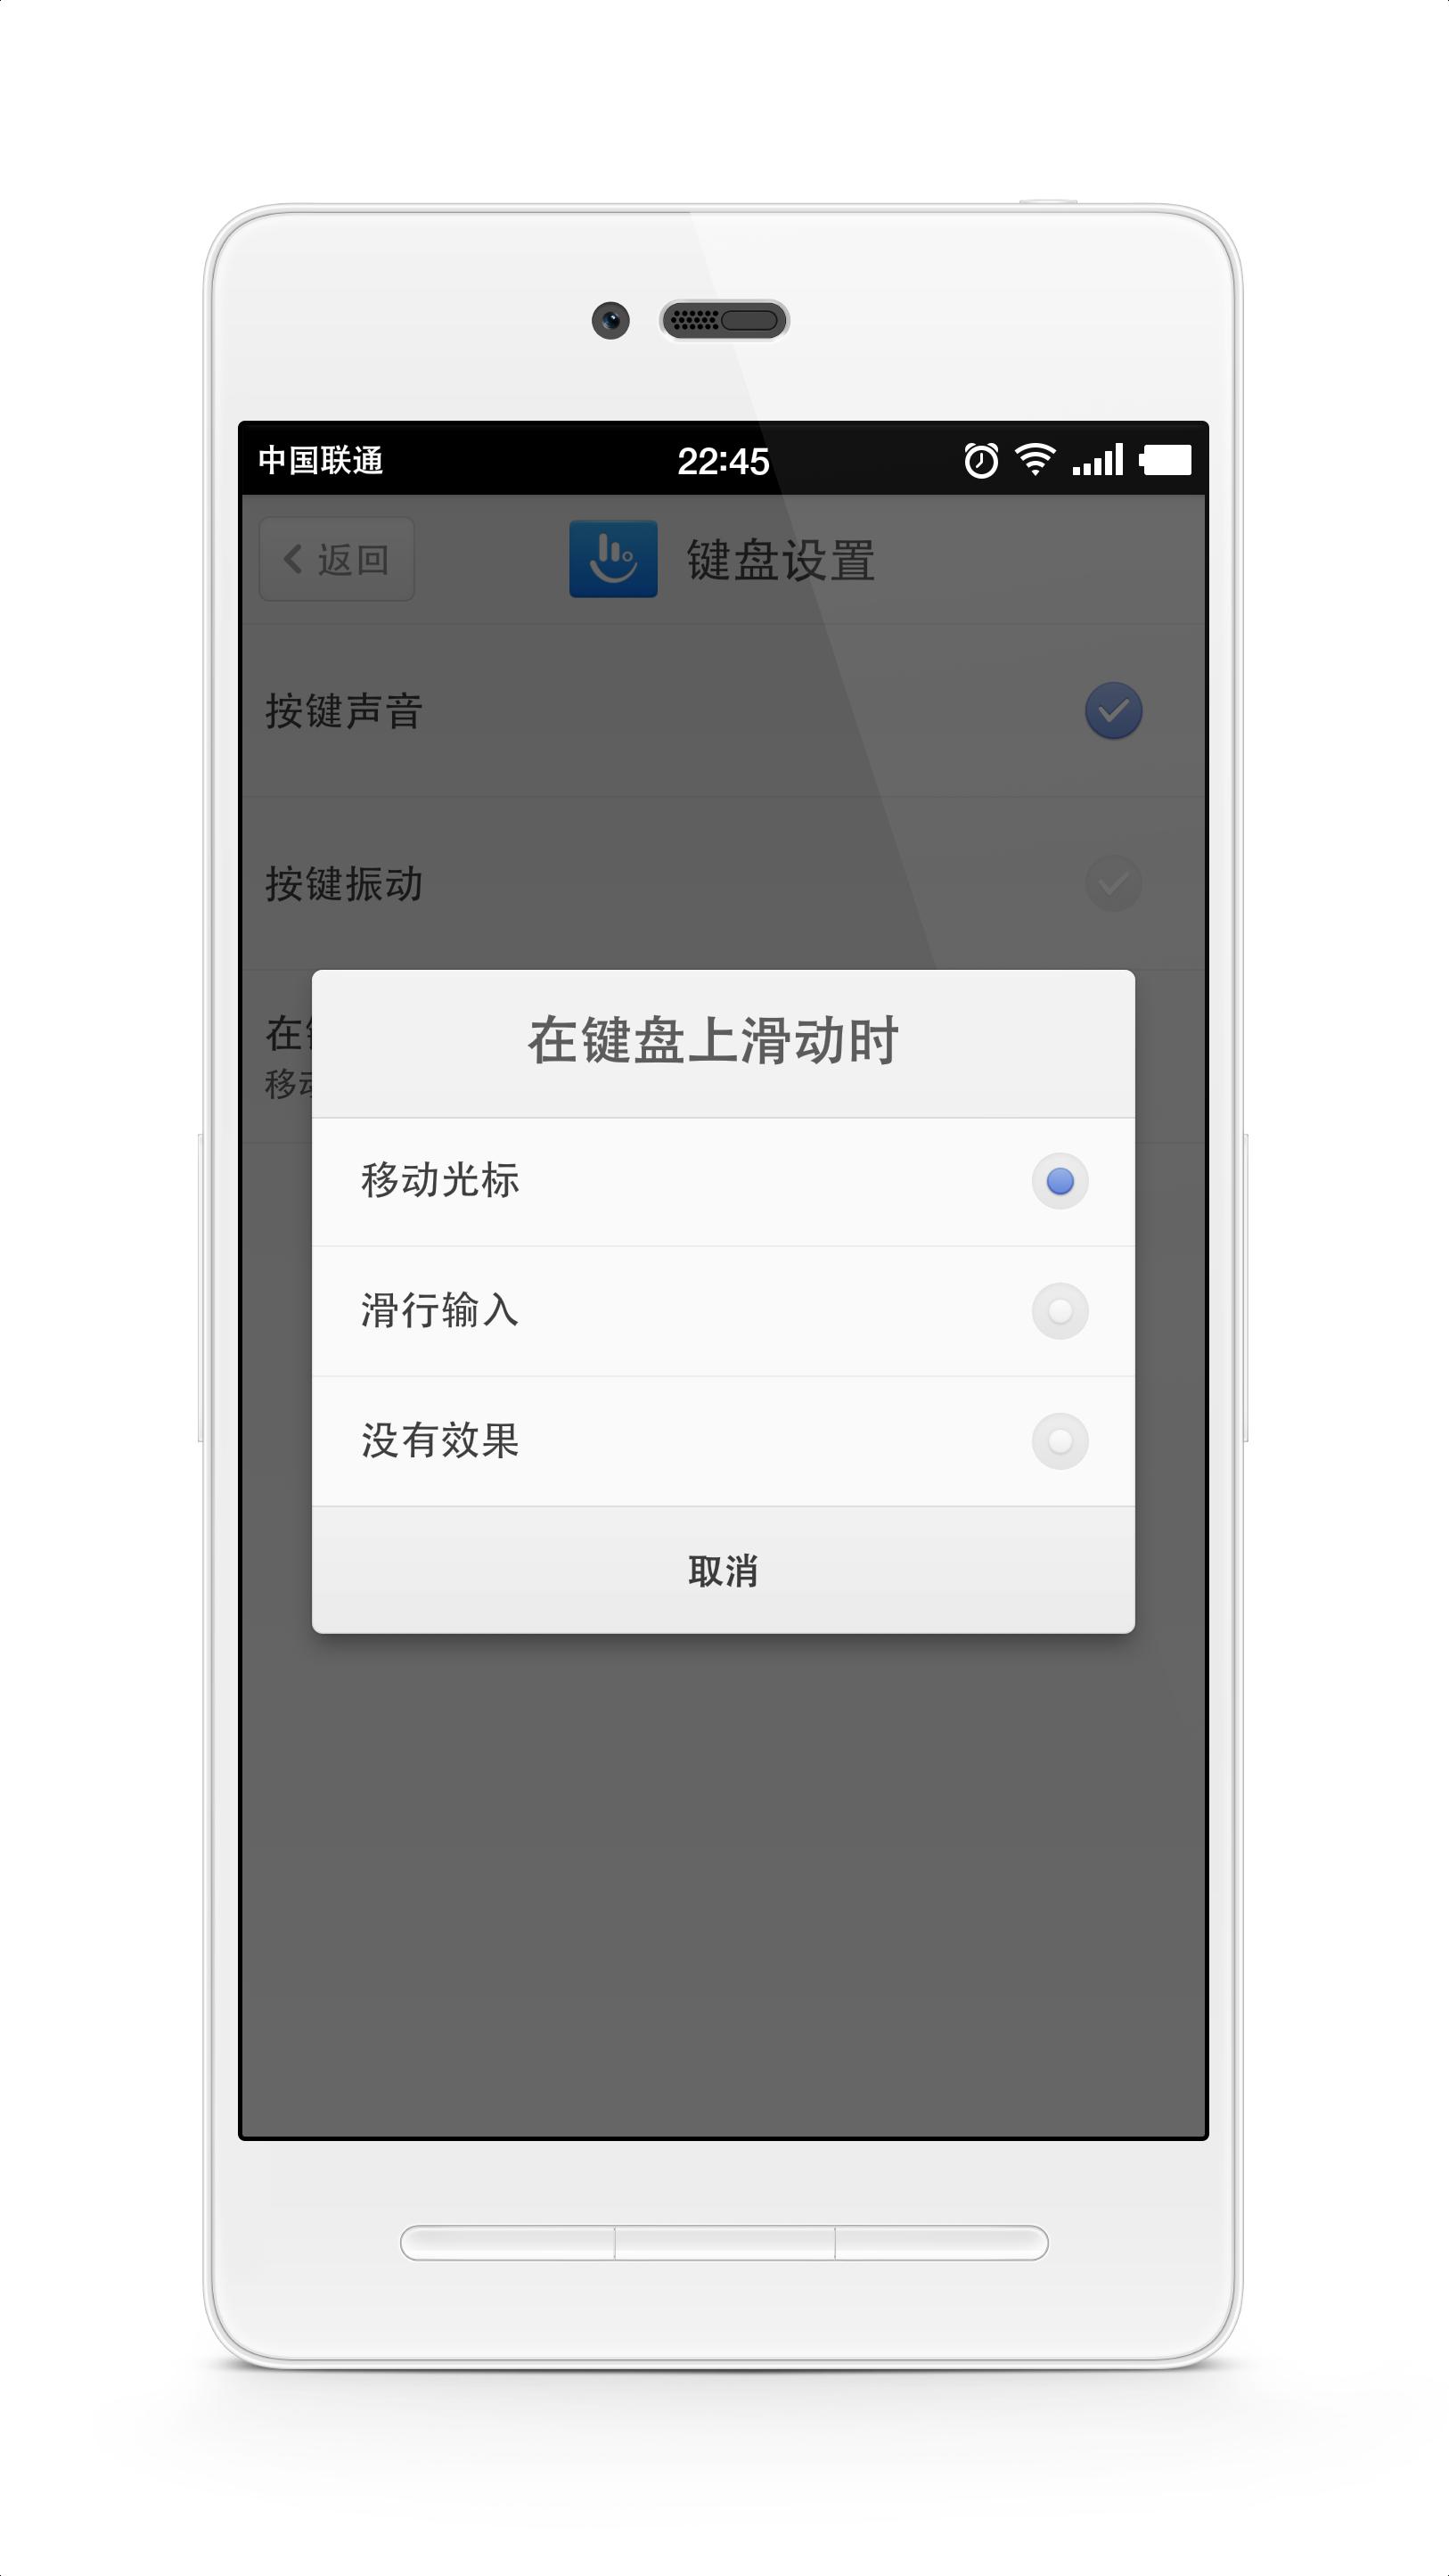 Screenshot_2015-12-03-22-45-59-498_触宝输入法Smartisan定制版.png